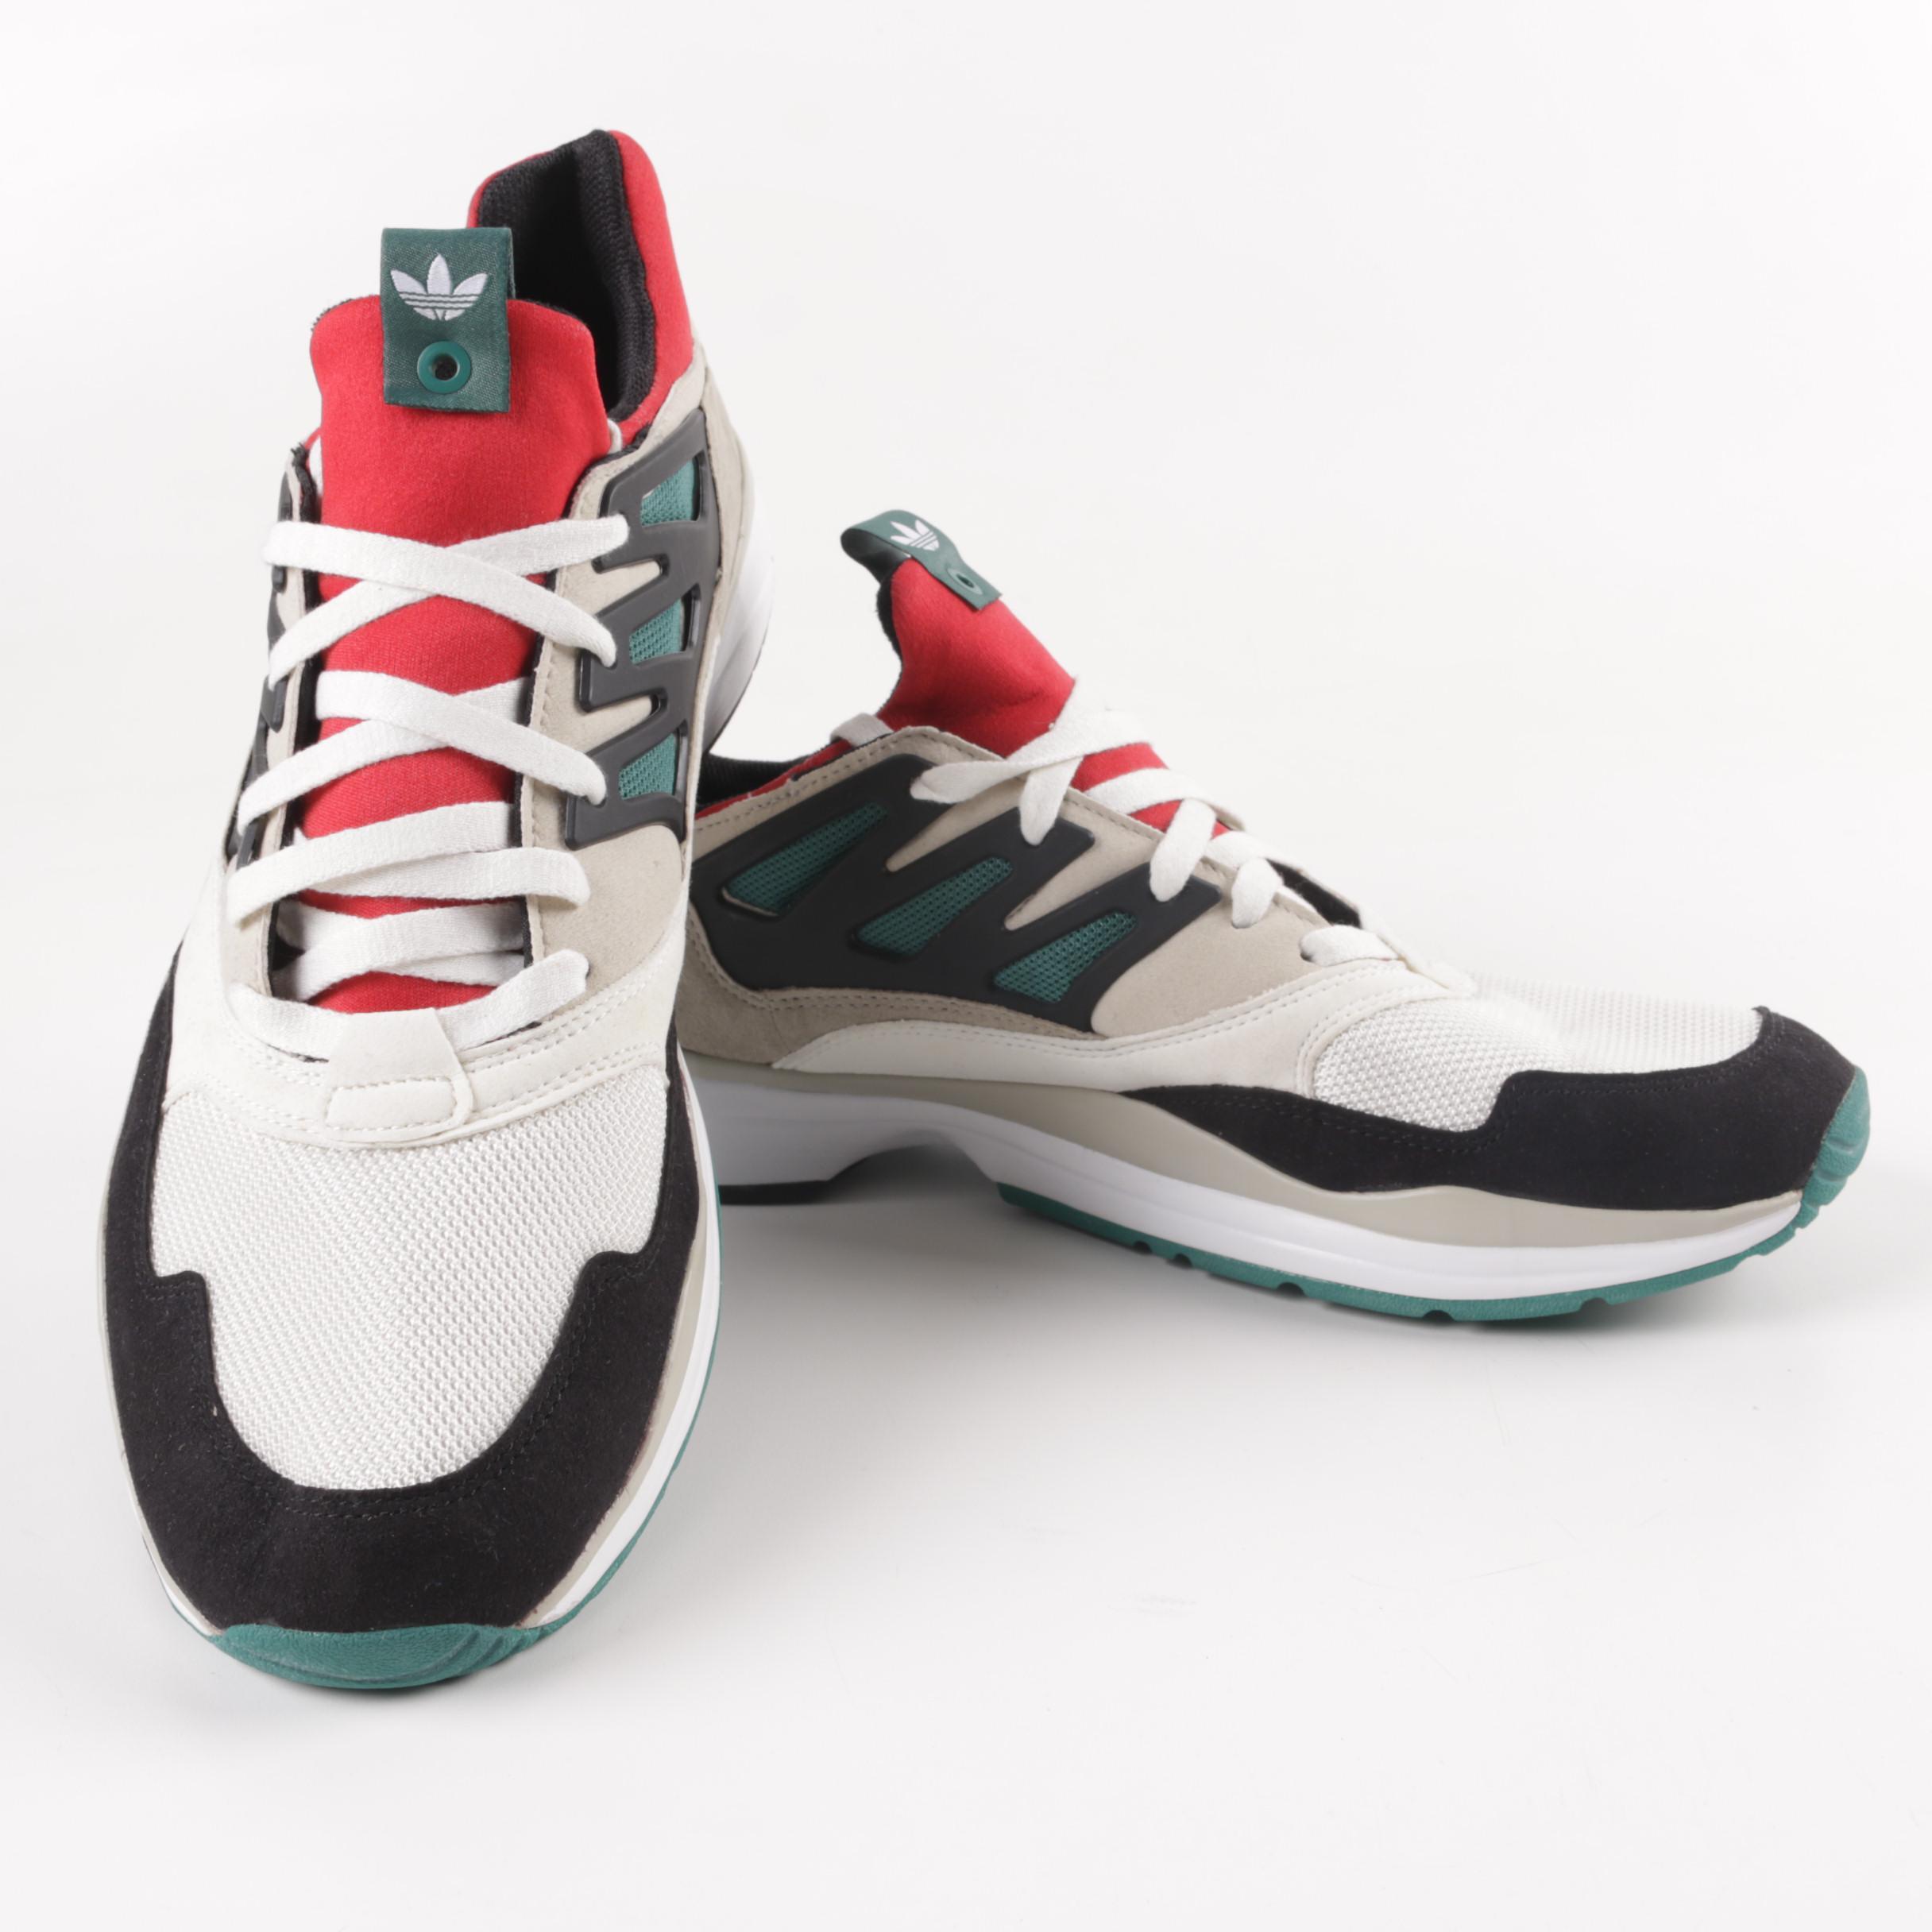 Adidas SHW 675001 Men's Sneakers | EBTH